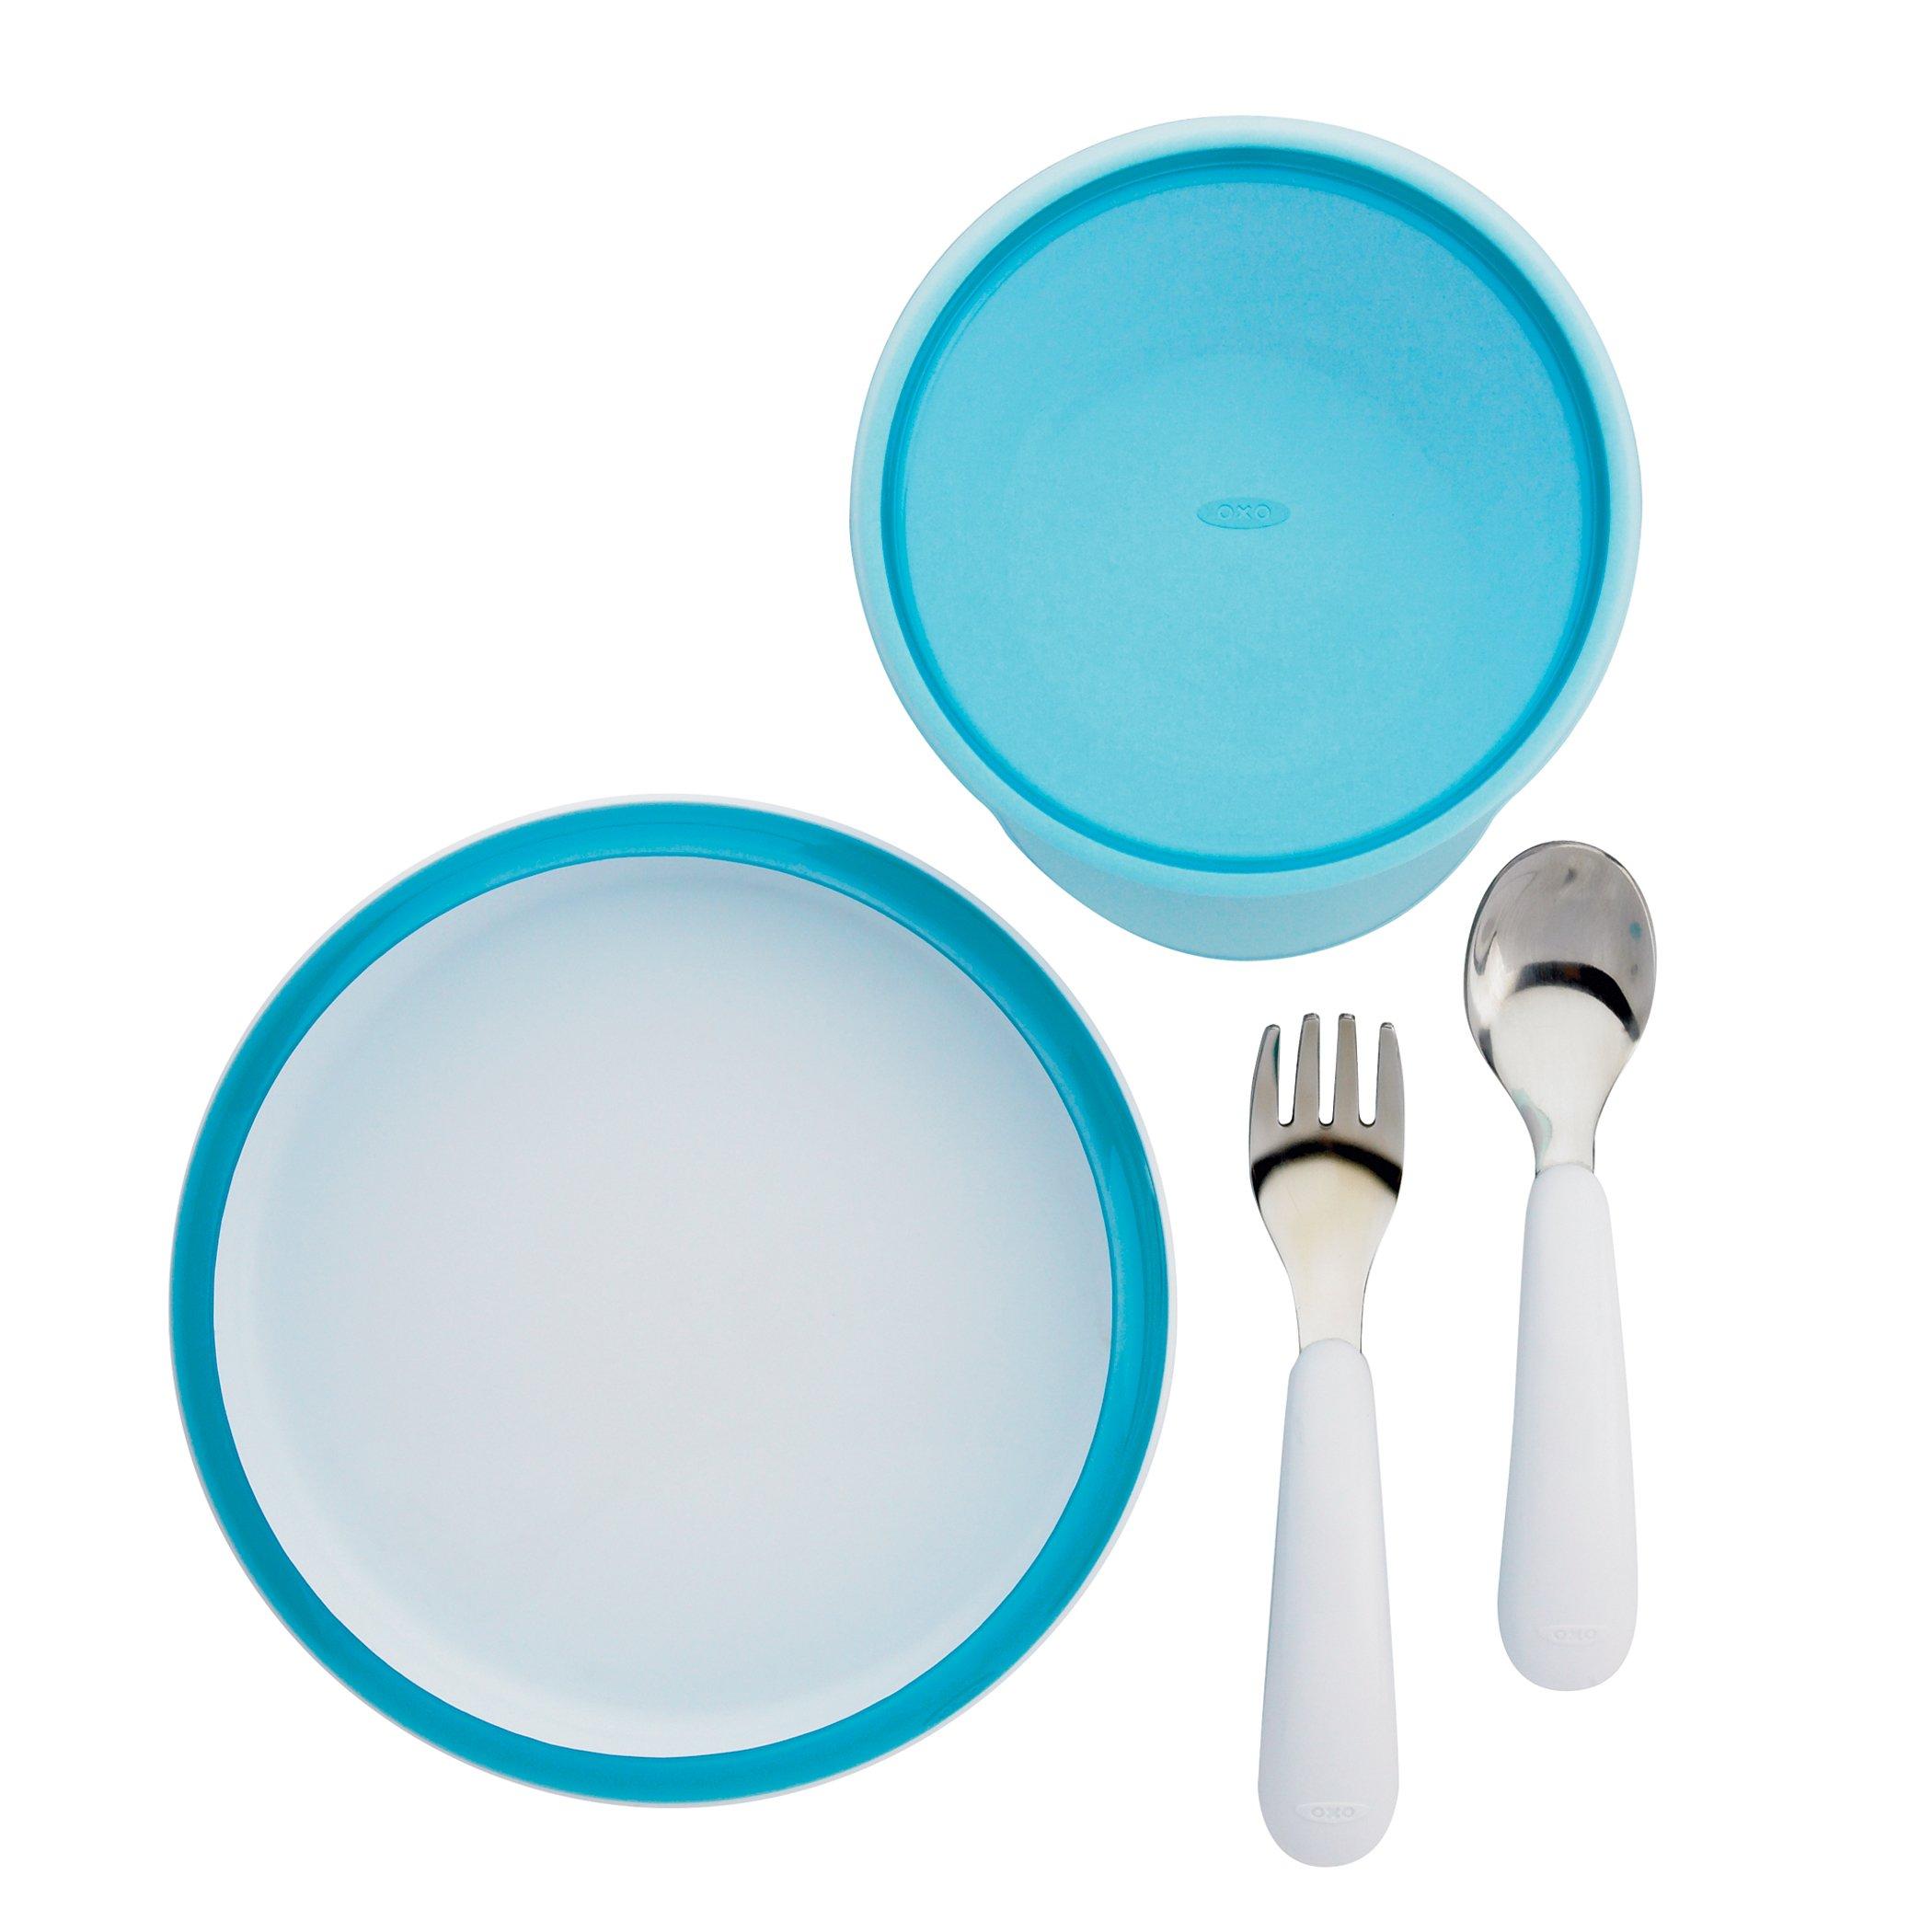 OXO Tot 4 Piece Feeding Set, Aqua